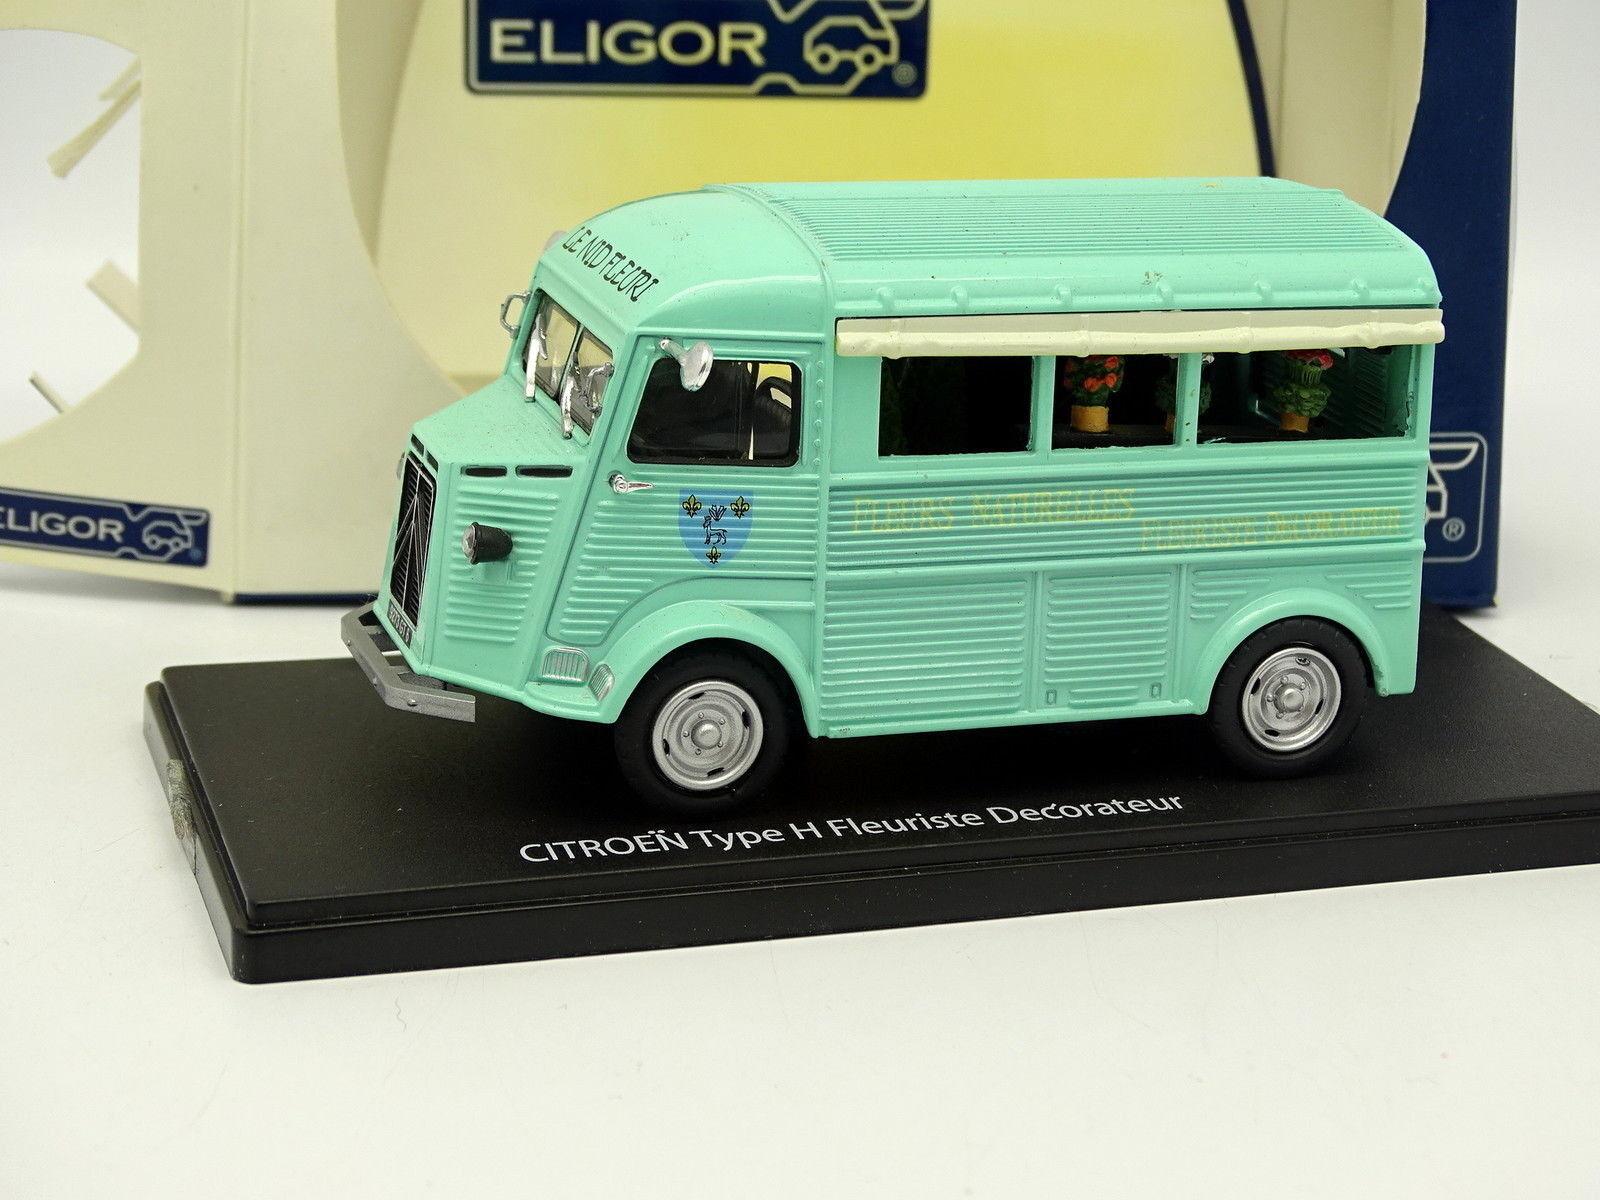 Eligor 1 43 - Citroen Art H bluemengeschäft Laden- Straßenhändler